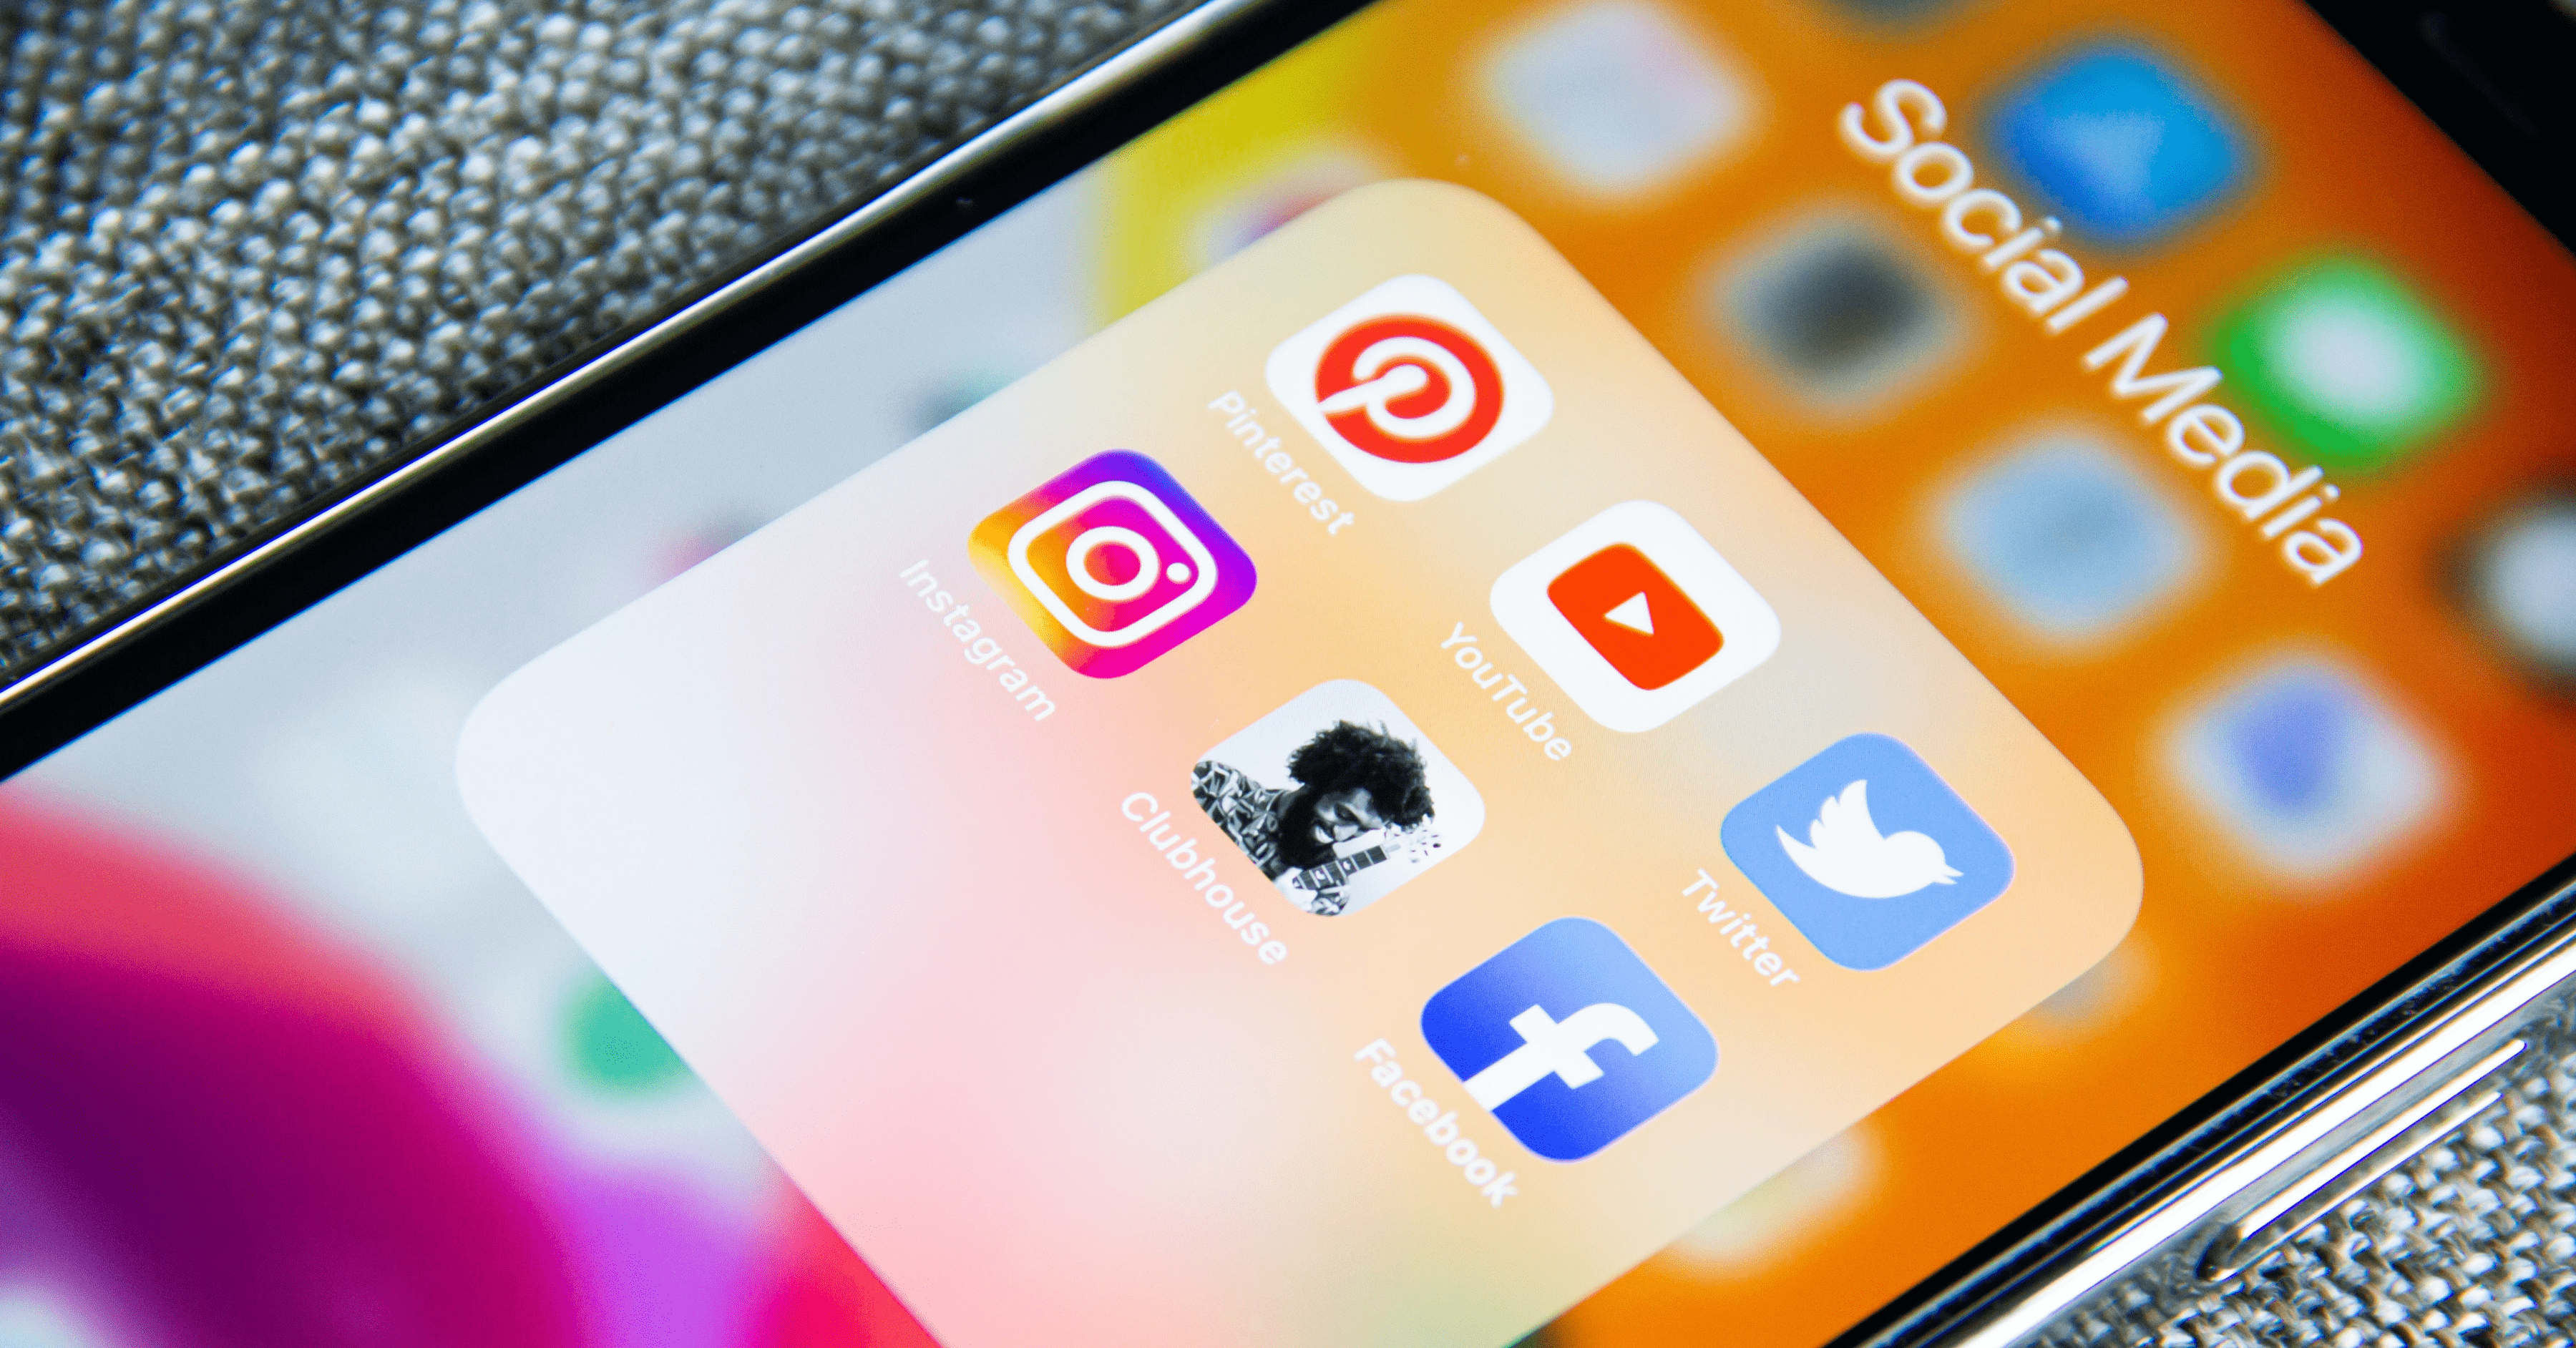 Advertising On Social Media: The Benefits